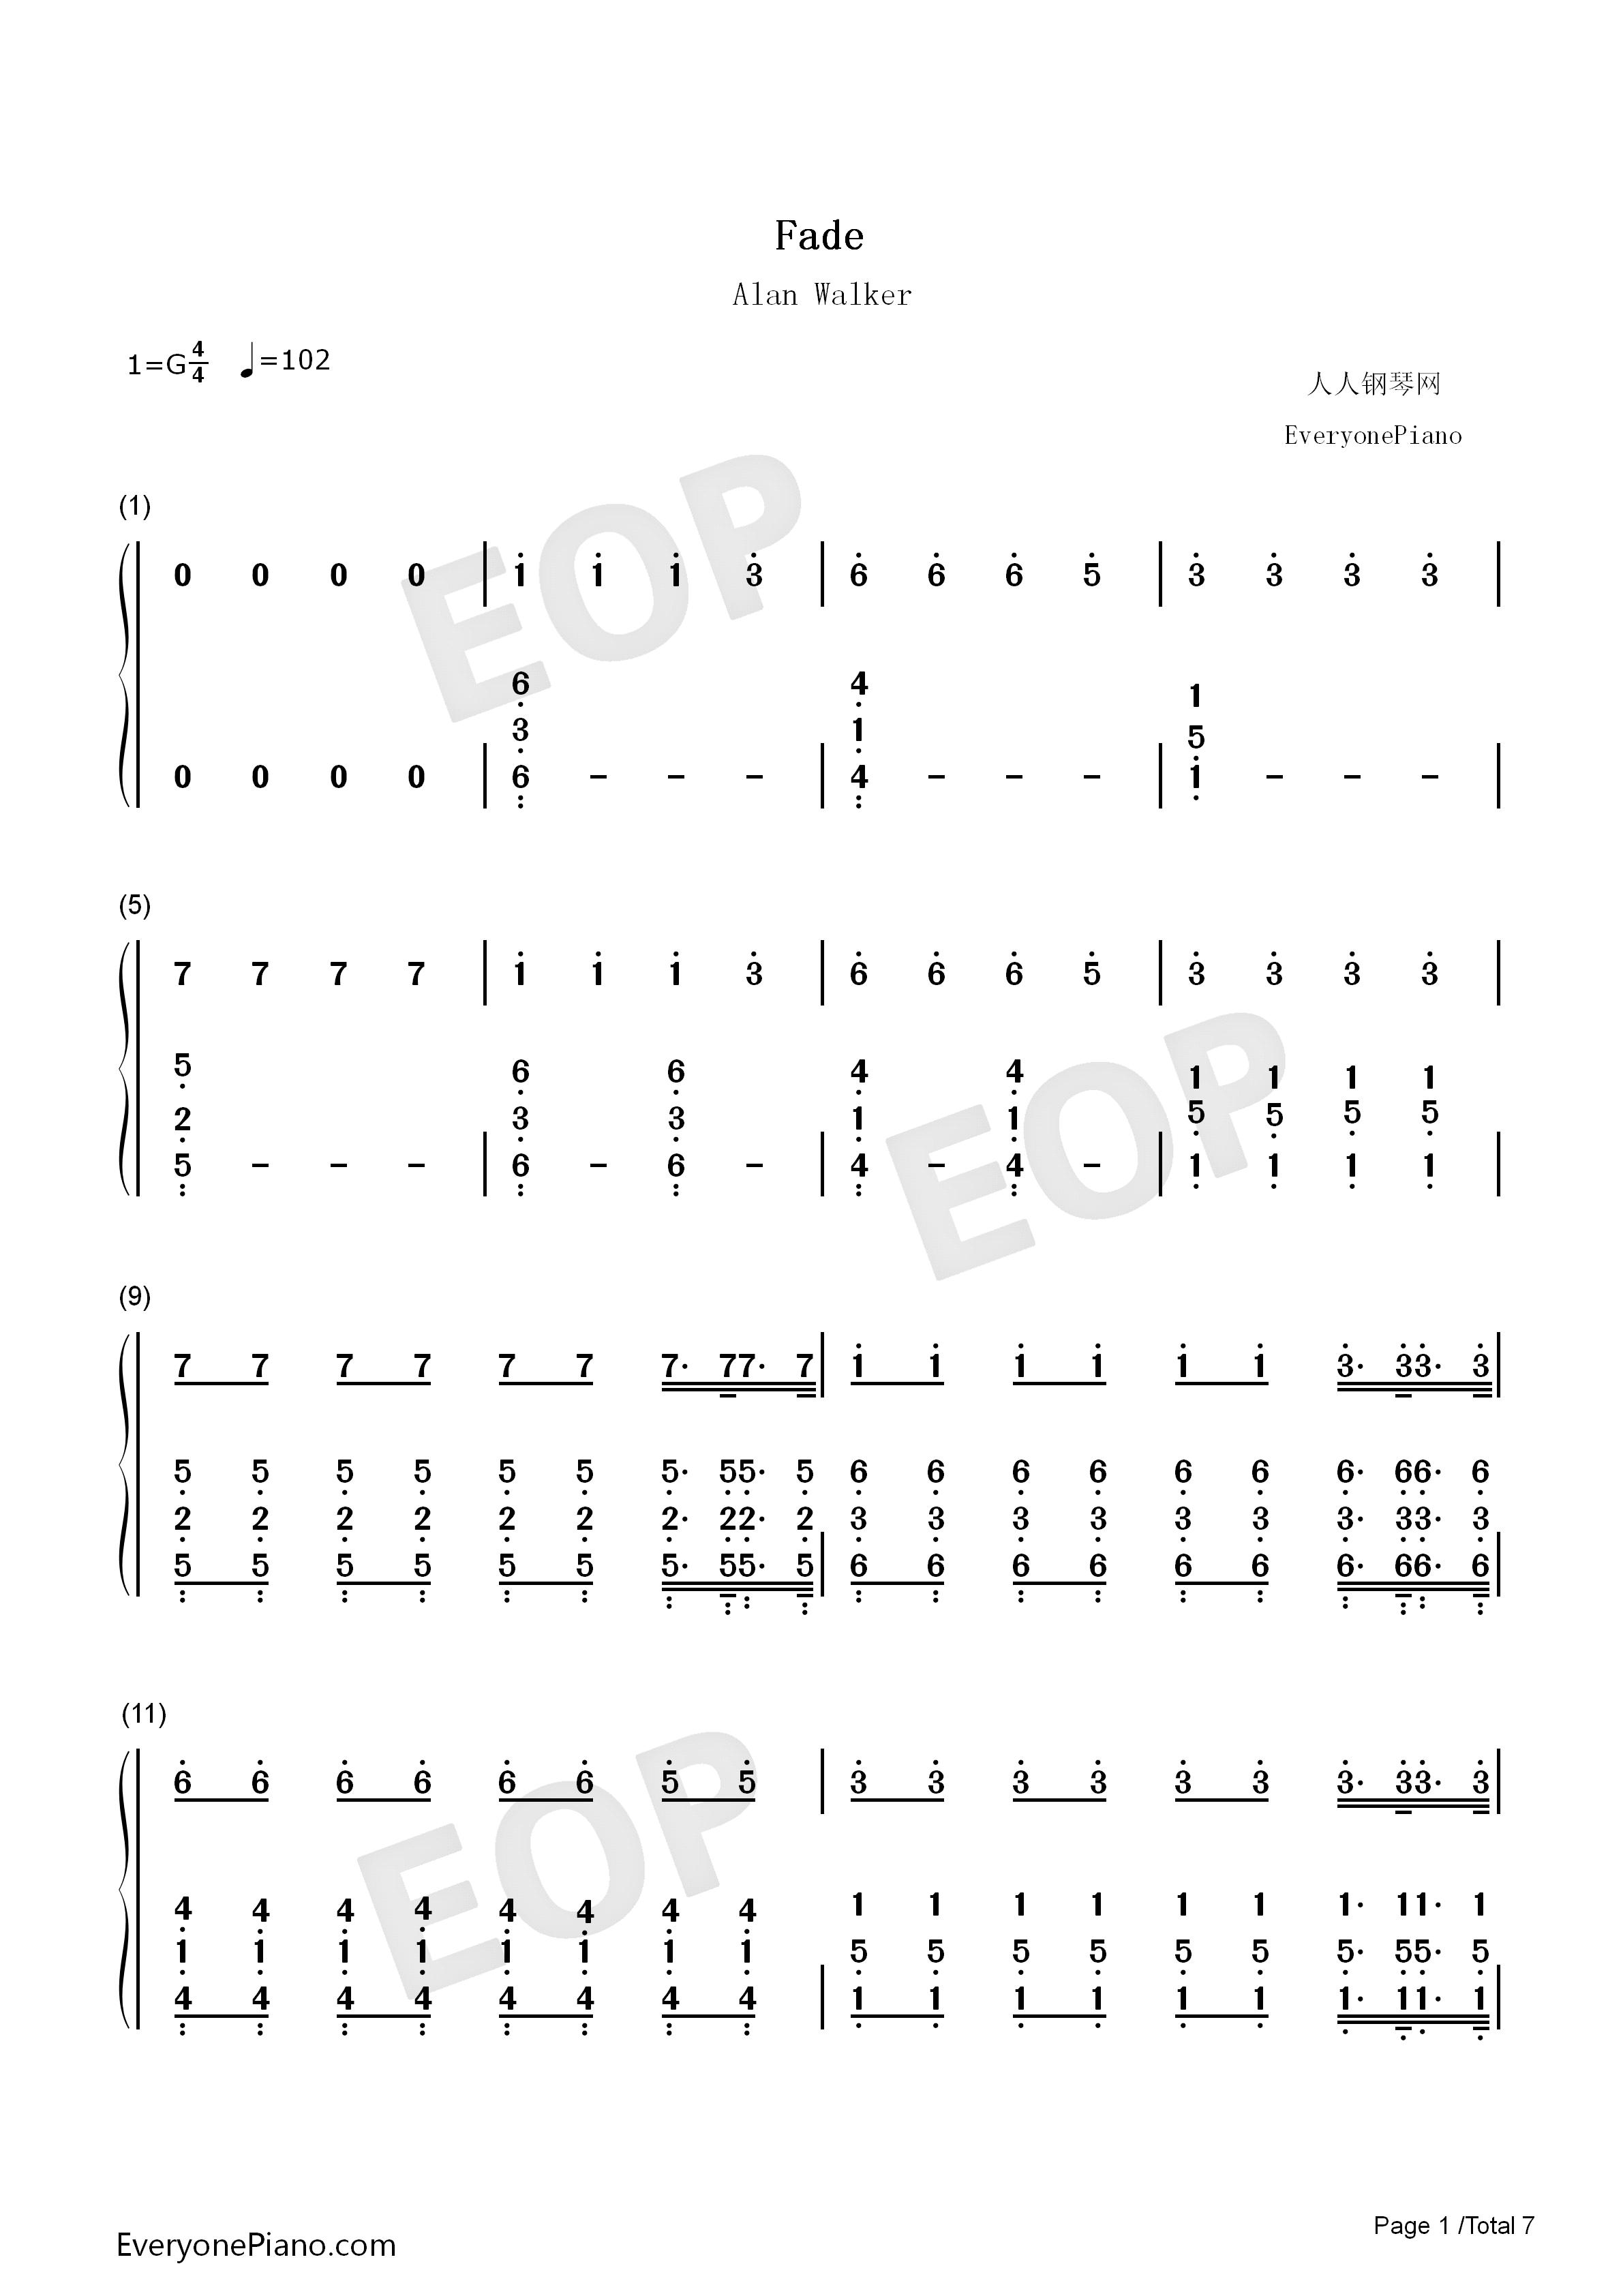 Fade-Alan Walker雙手簡譜預覽1-鋼琴譜檔(五線譜、雙手簡譜、數位譜、Midi、PDF)免費下載